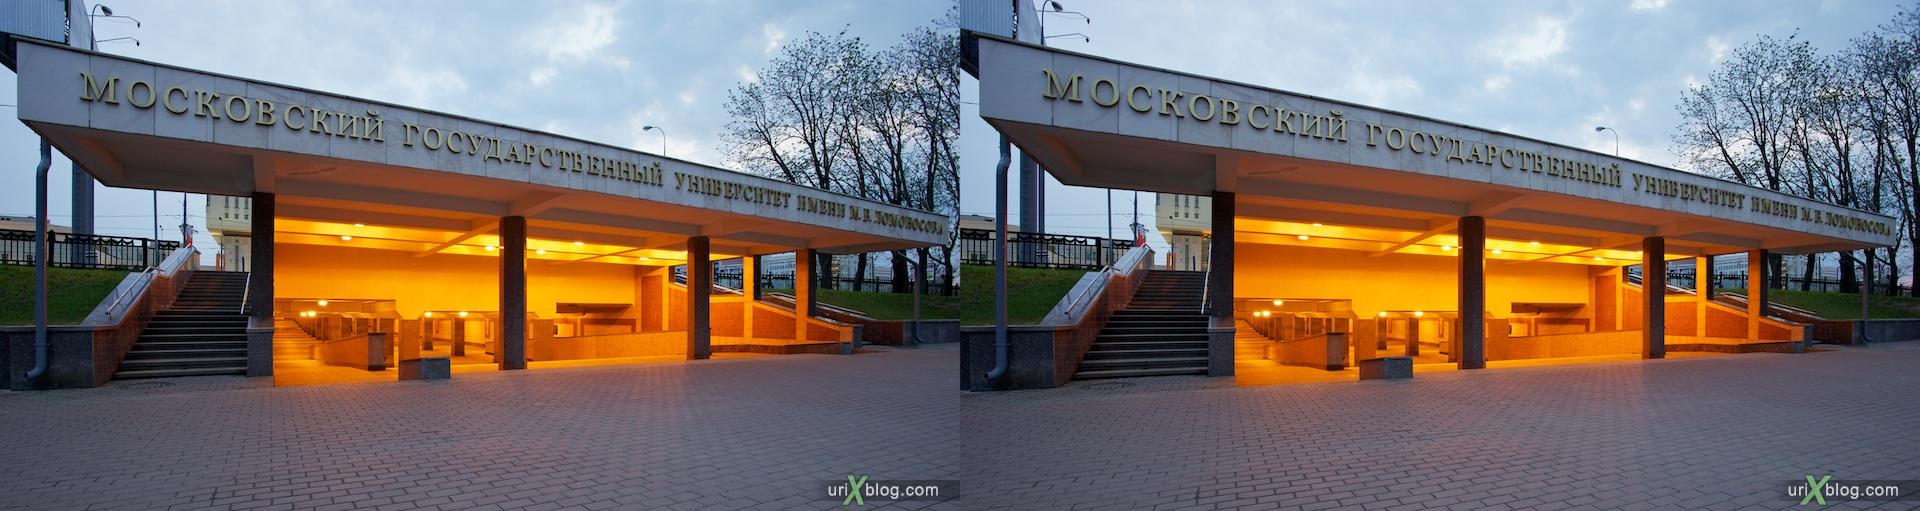 2010 3D, stereo, cross-eyed, стерео, стереопара Москва около Университета МГУ Moscow near the MSU подземный переход библиотека